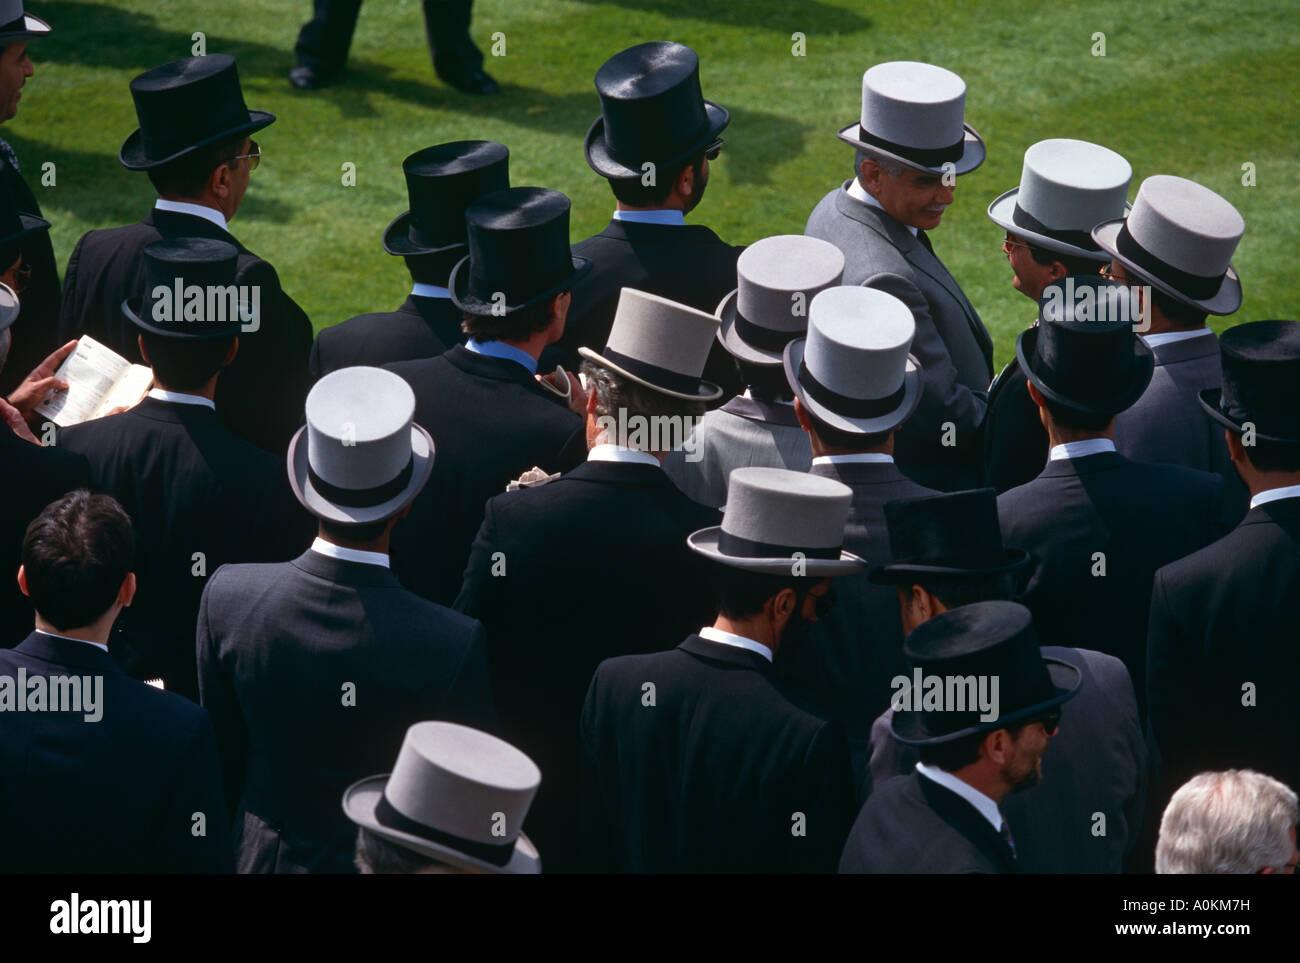 Top hats at Royal Ascot horserace meeting in Ascot, Berkshire, UK - Stock Image